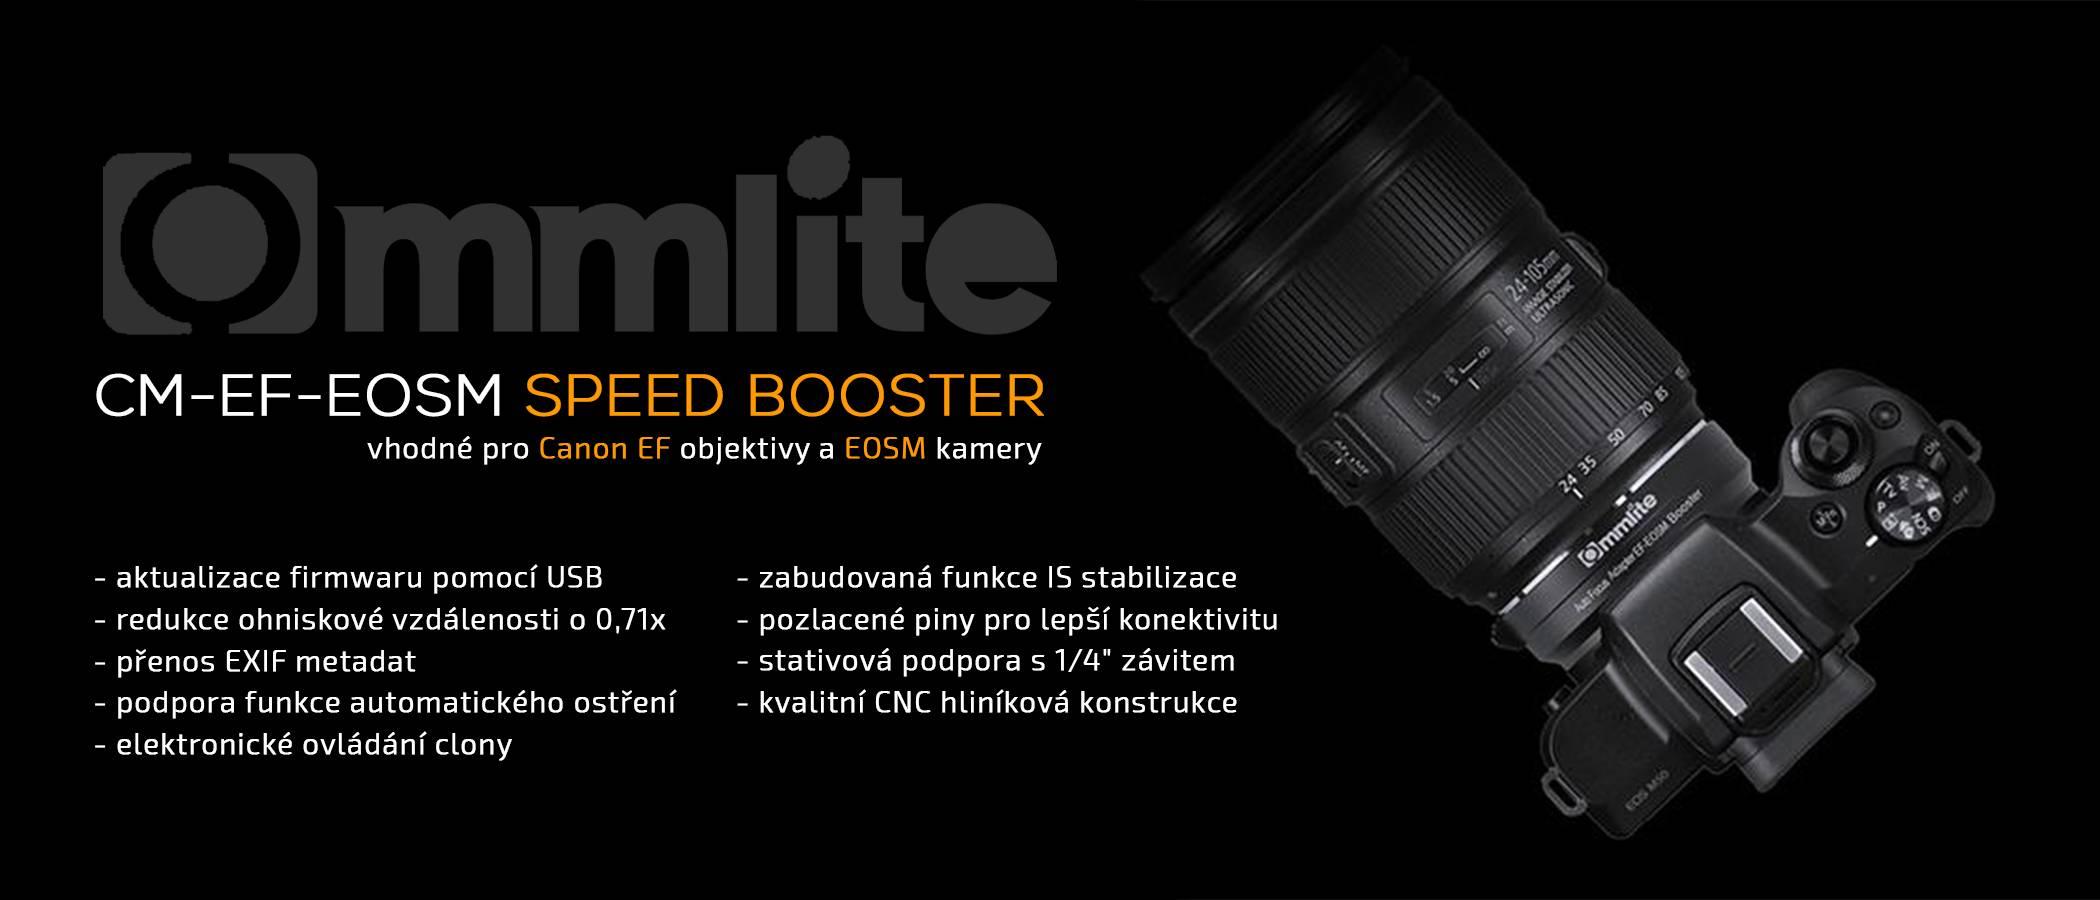 film-technika-commlite-cm-ef-eosm-speed-booster